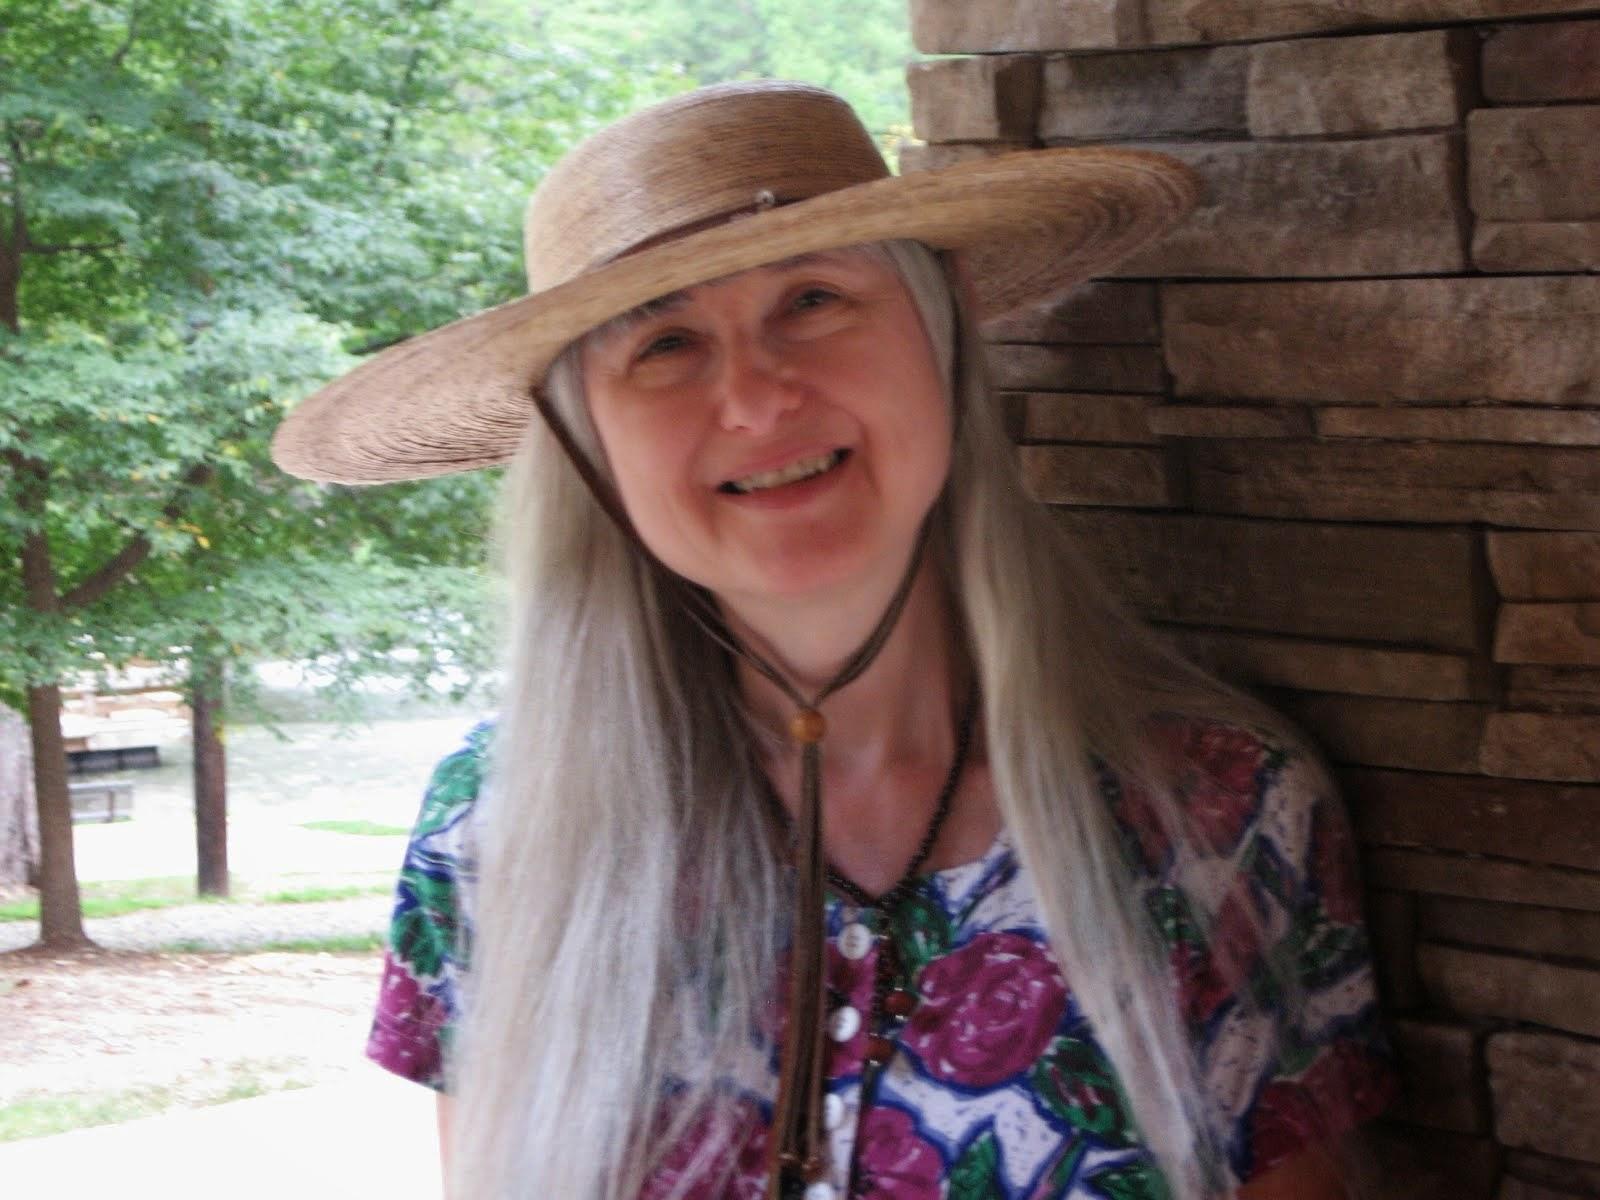 Joan C. Thomson